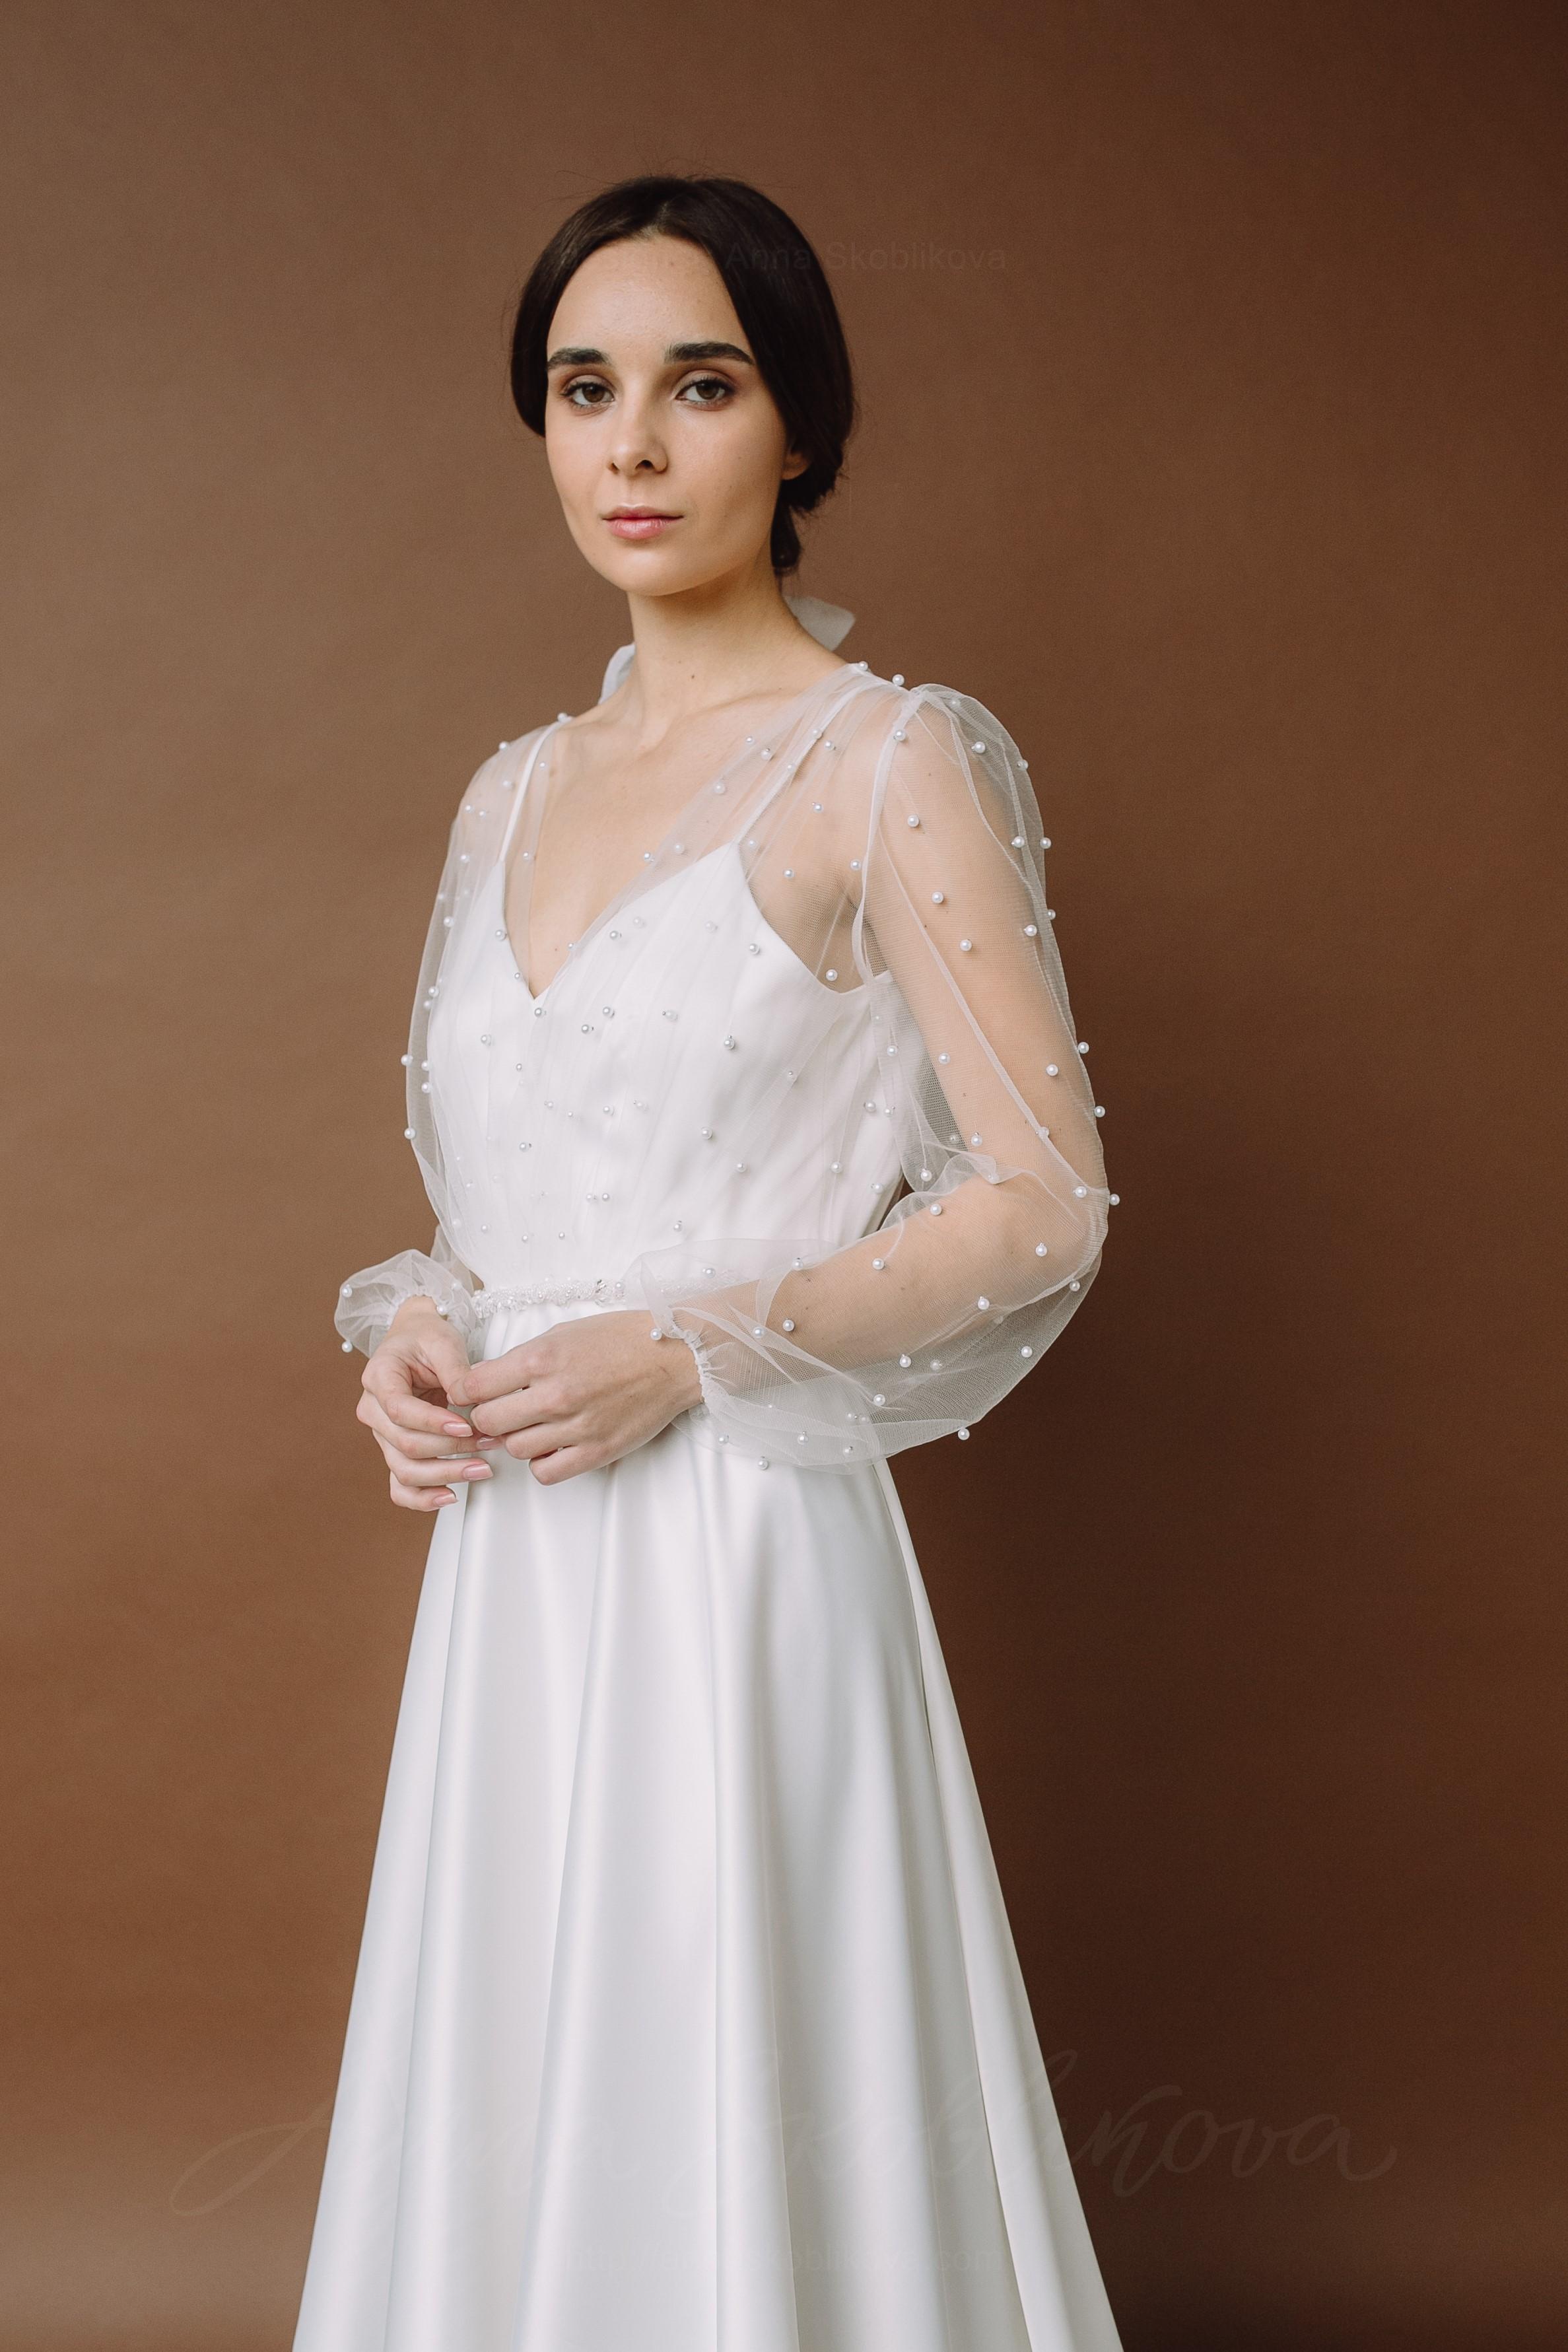 Romantic wedding dress - Alisa by Anna Skoblikova